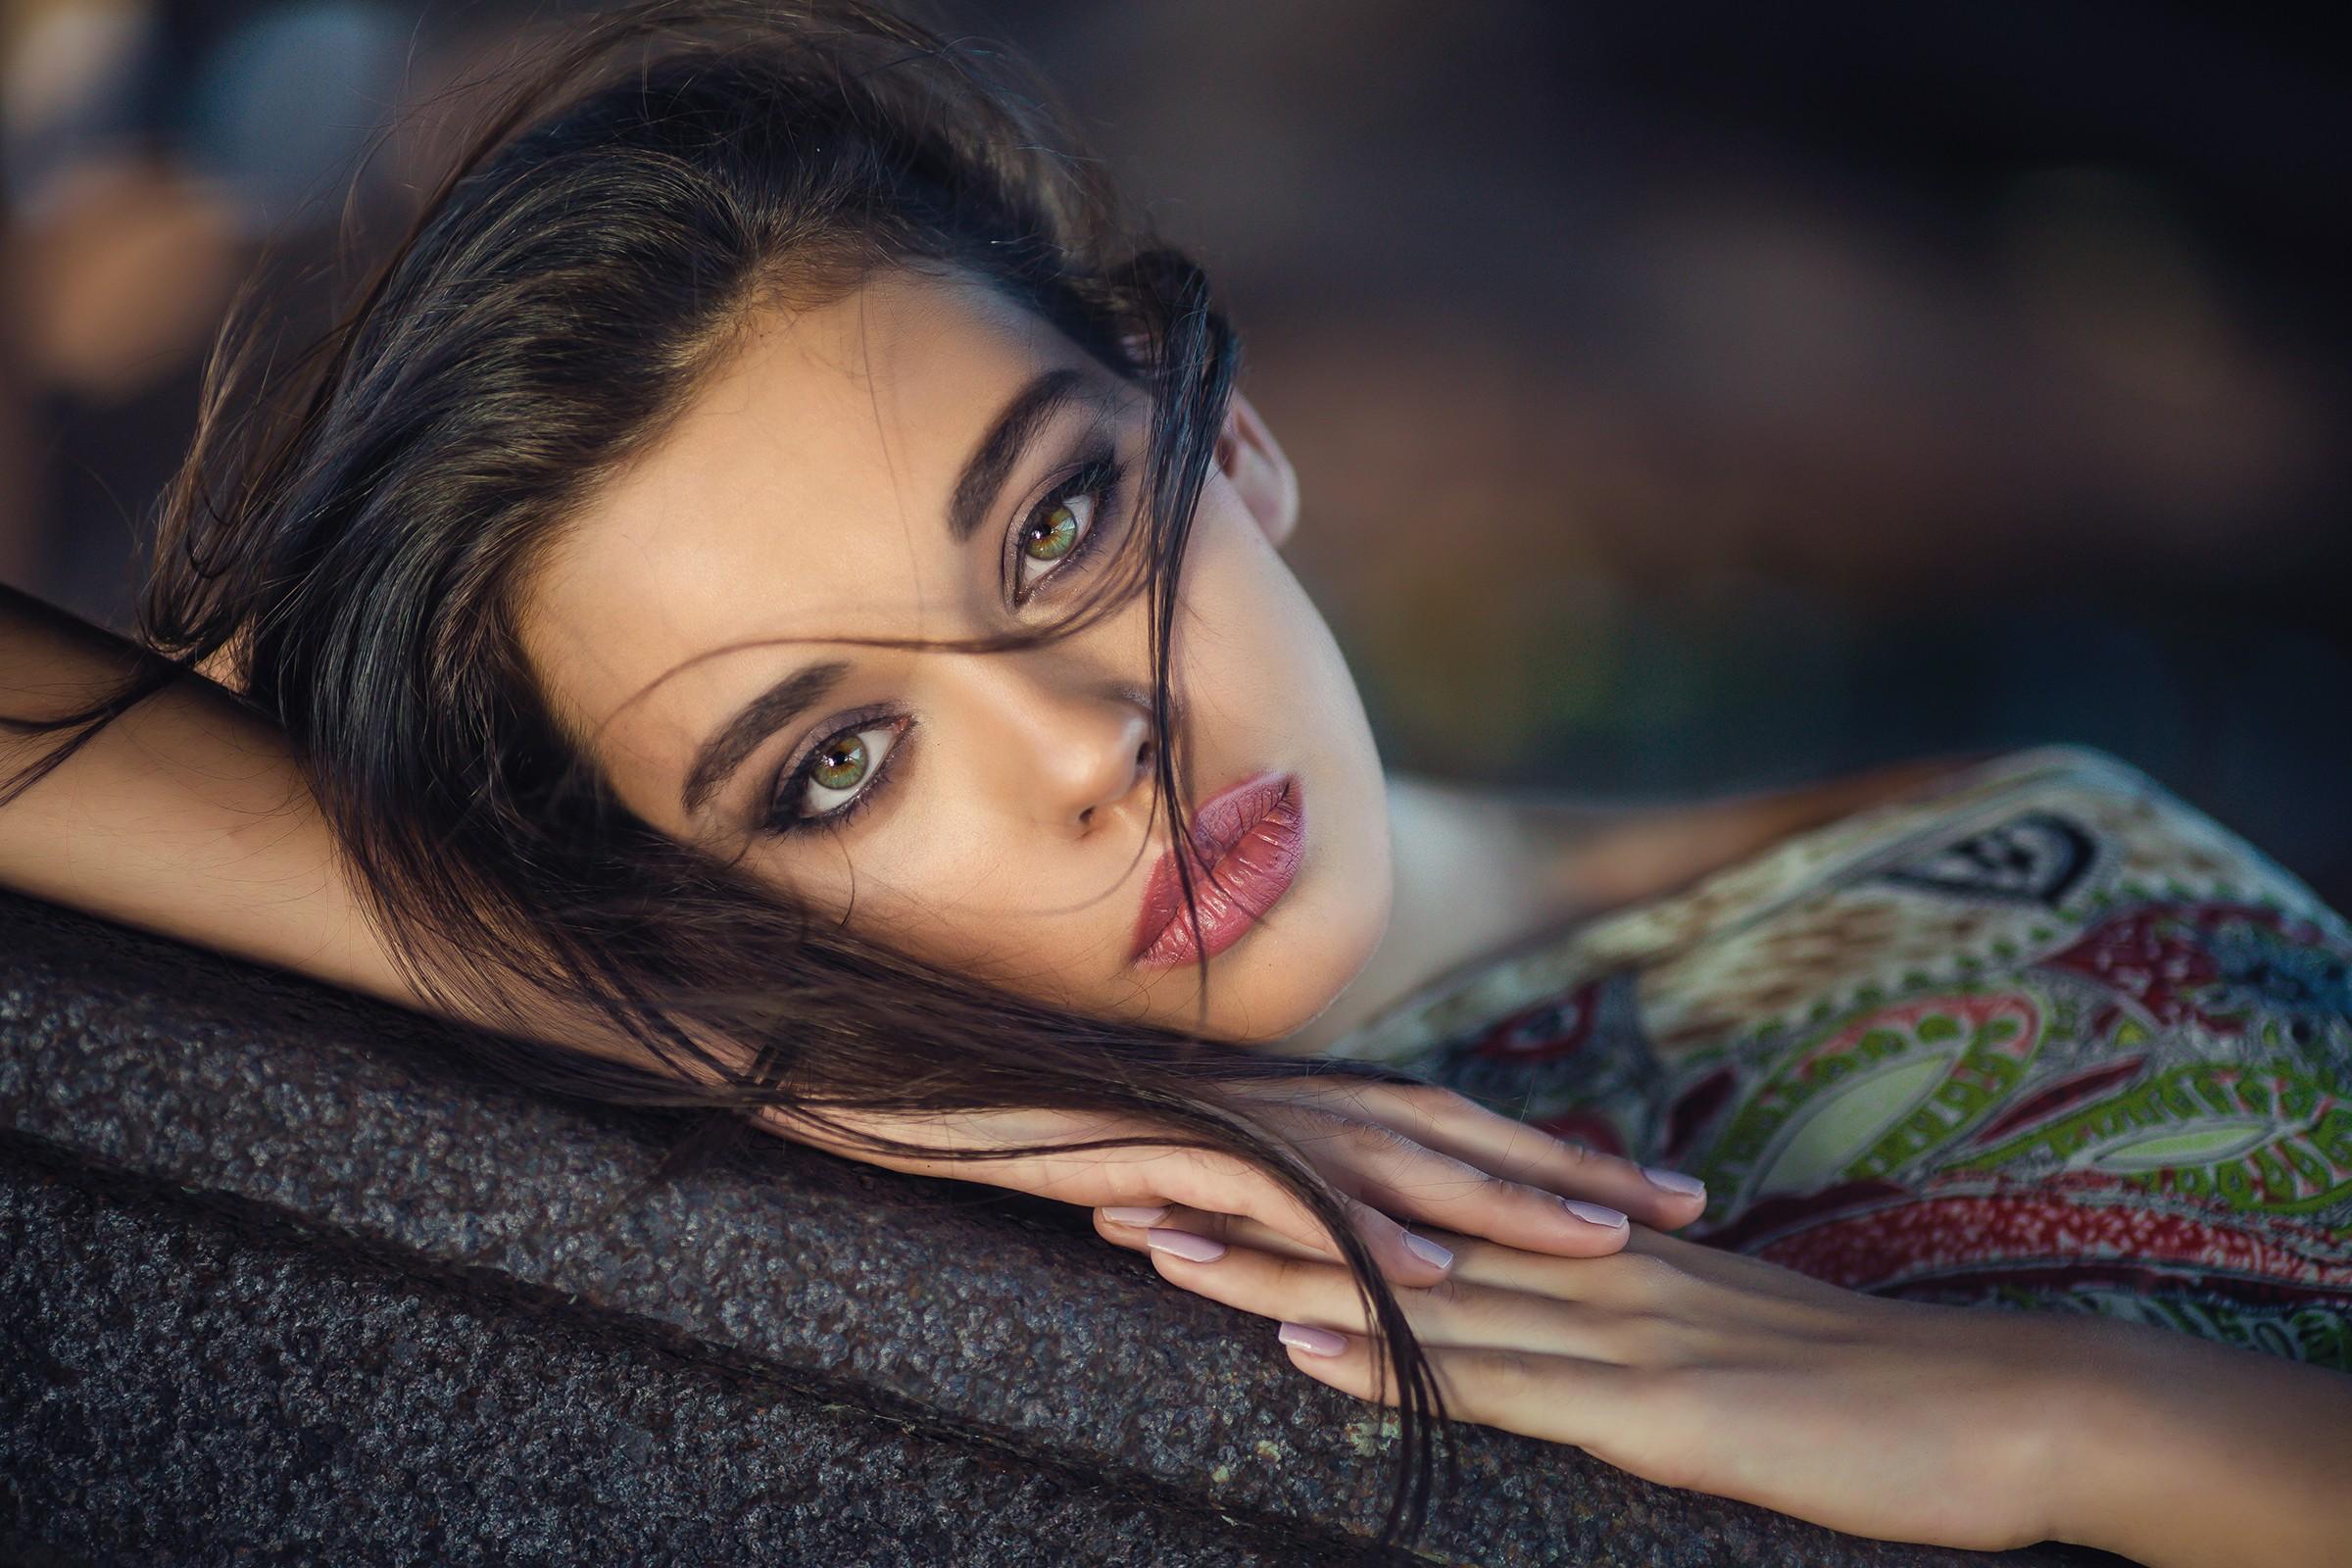 Wallpaper Face Women Depth Of Field Green Eyes Black Hair